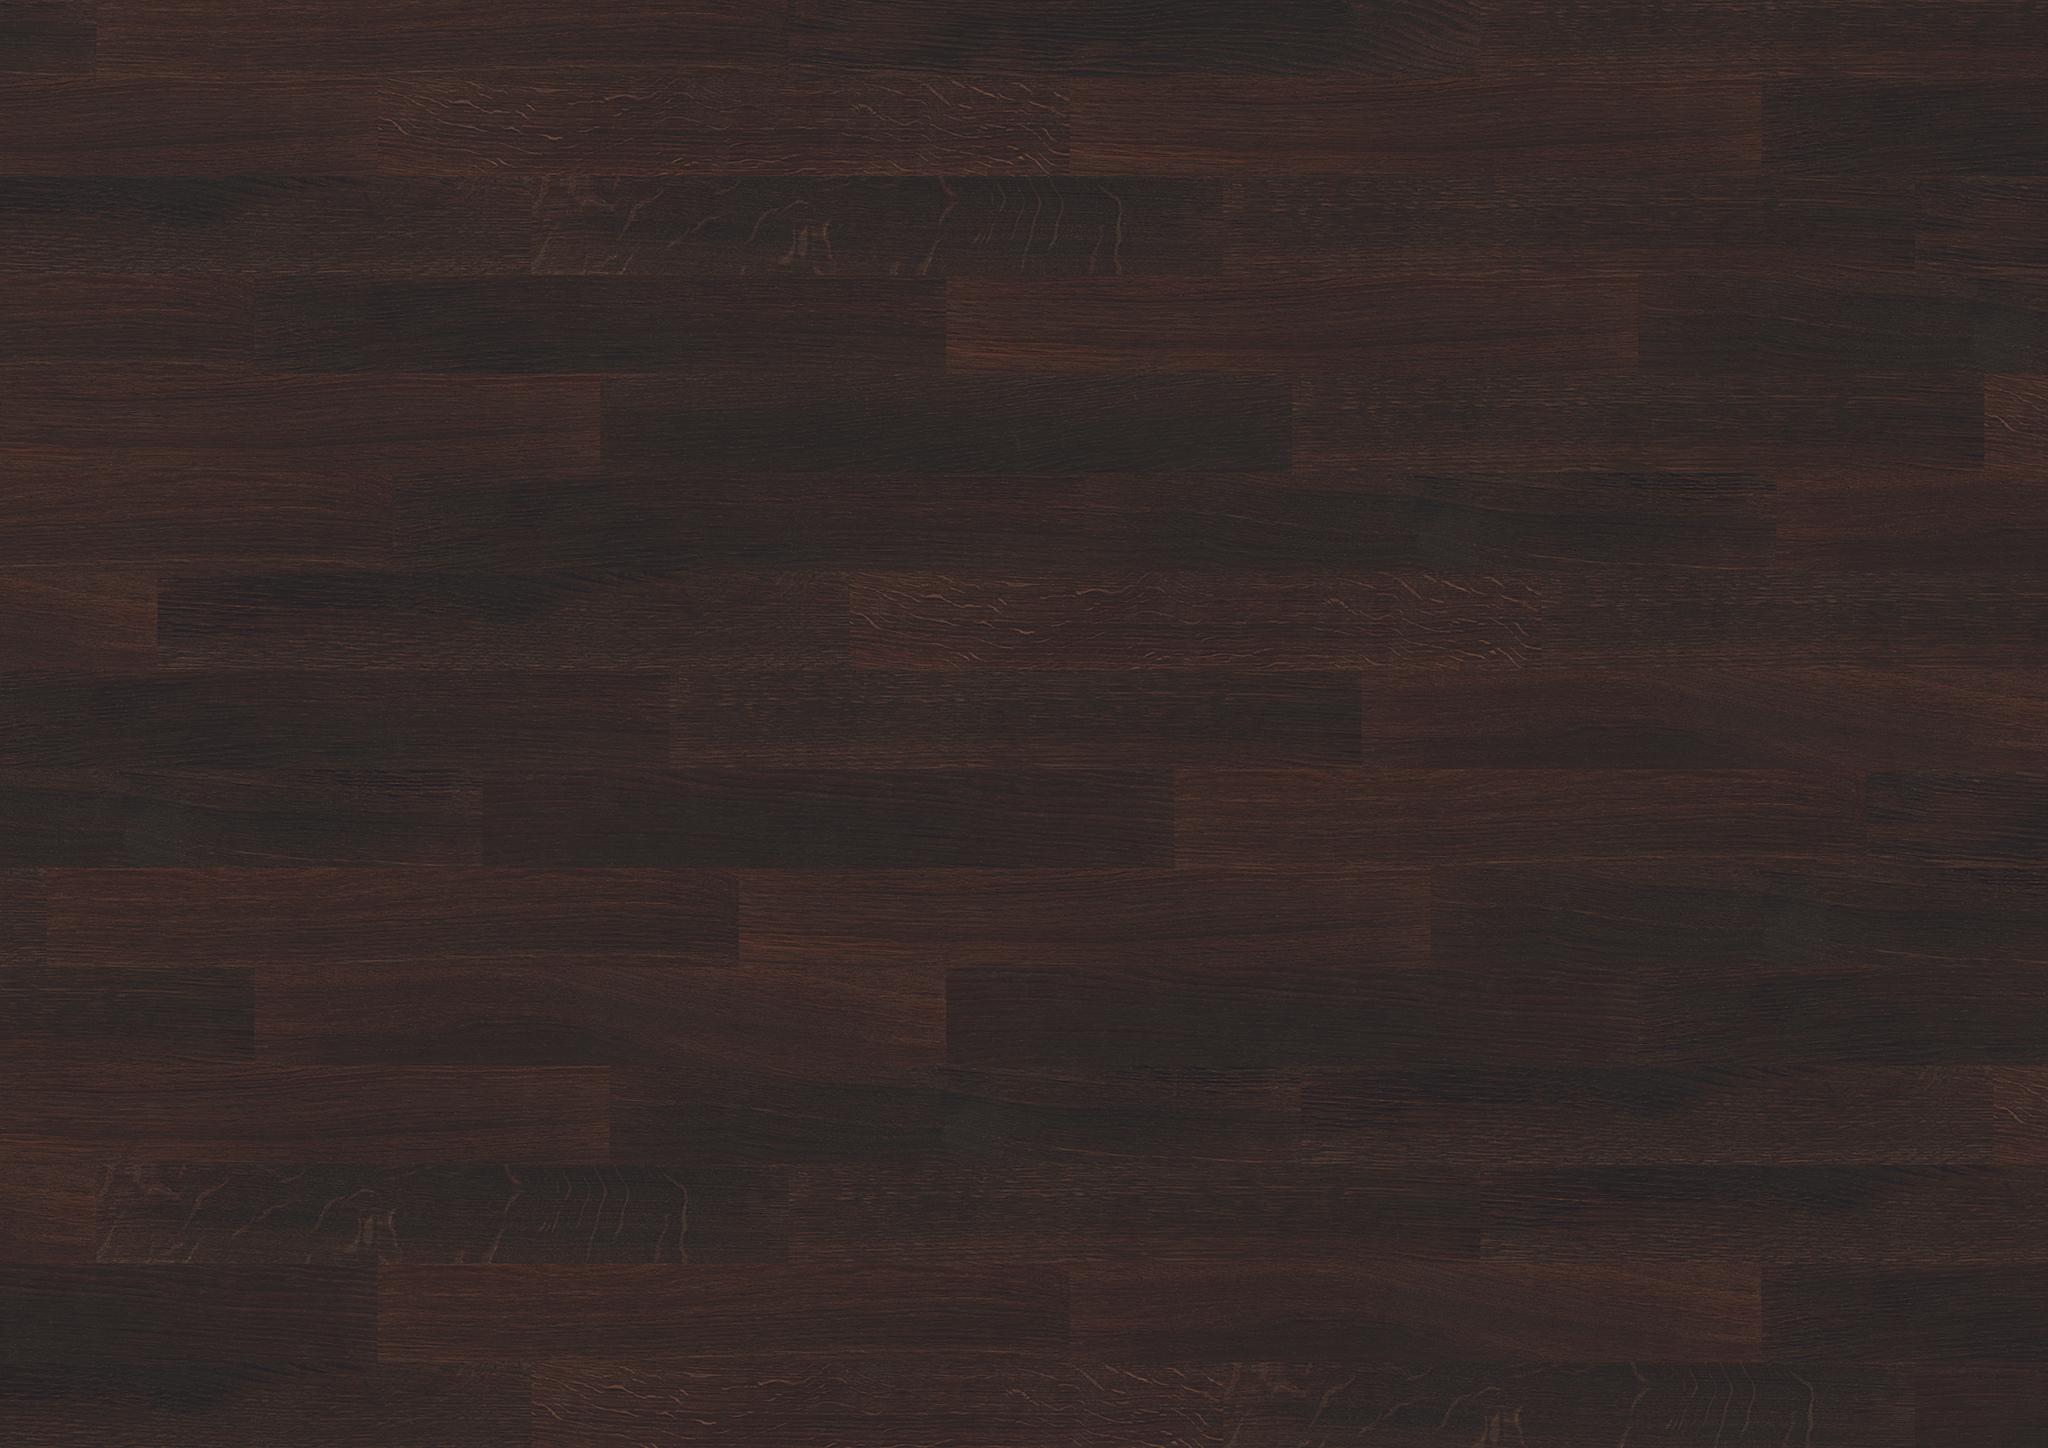 PARAT Dos smoked oak natural 11mm